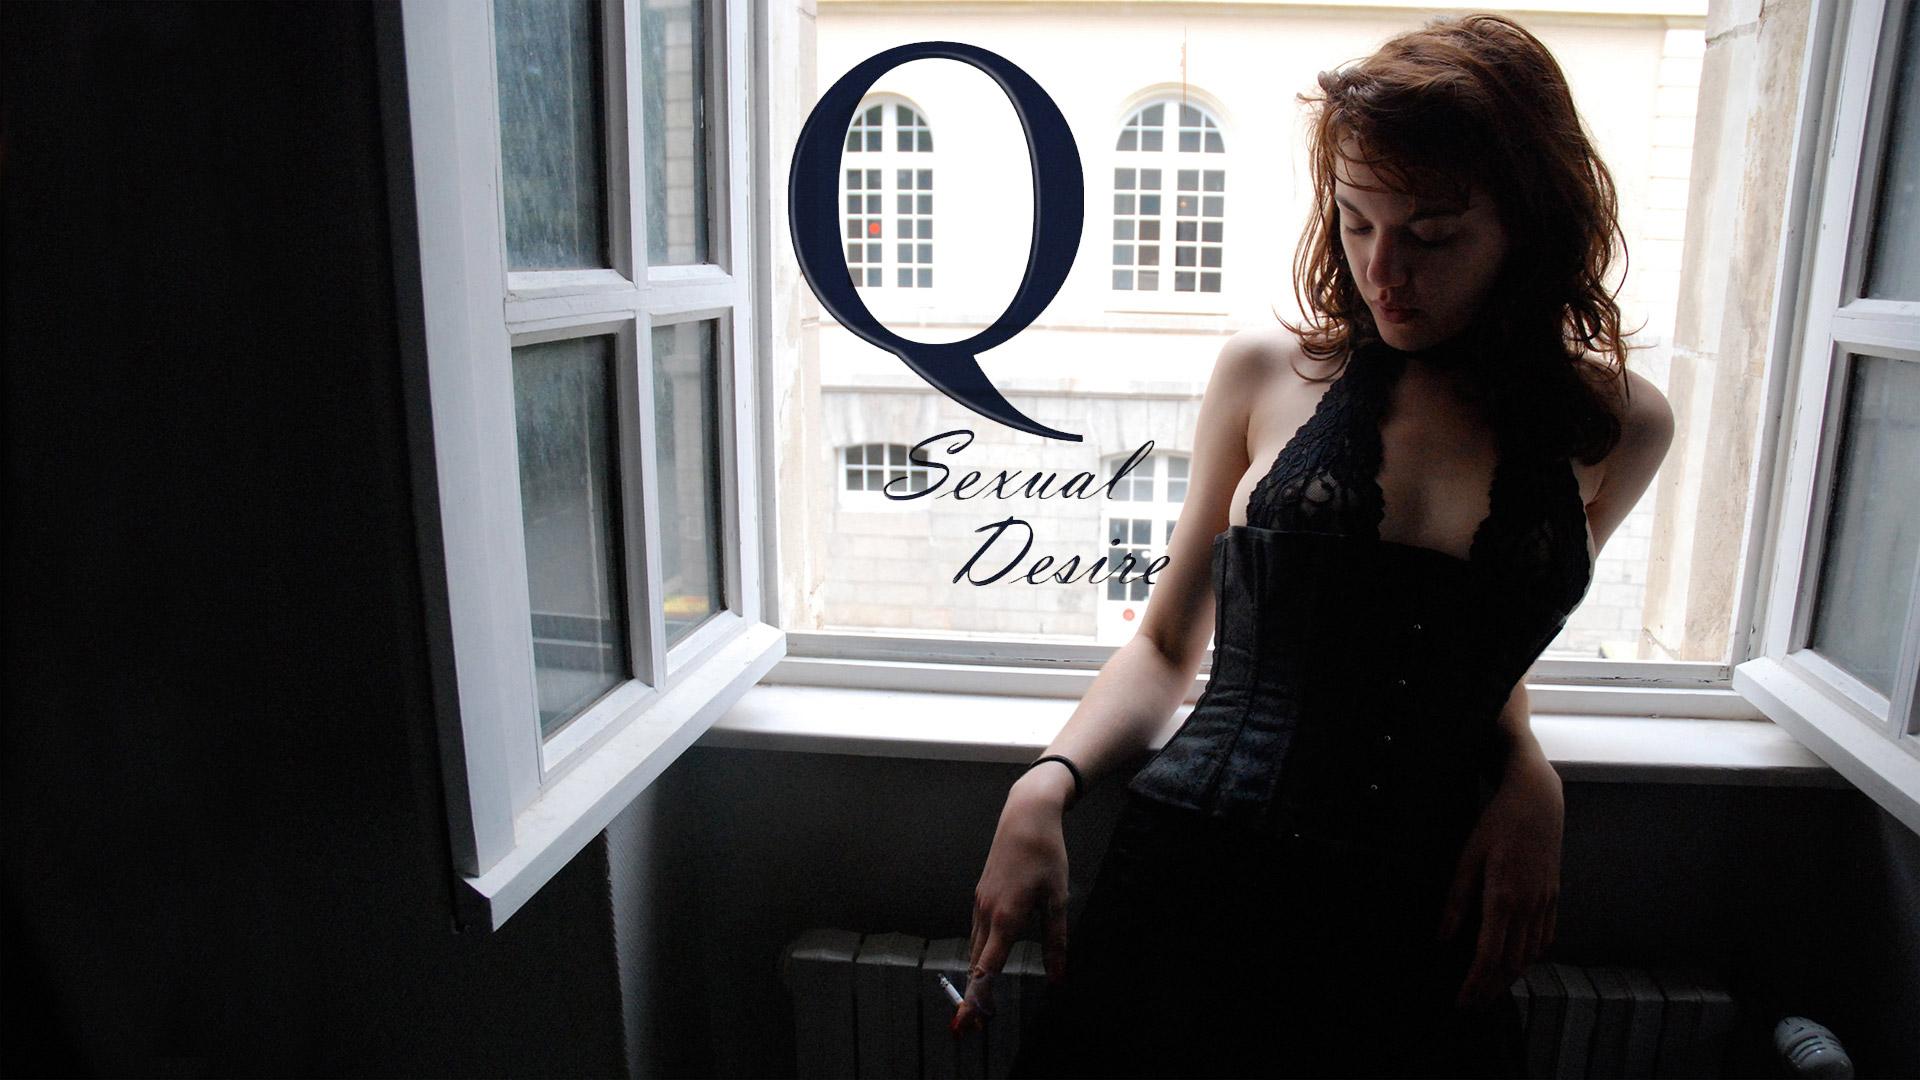 18 Q Sexual-Desire 2011 Uncut Bluray 480P Esub Download  Watch Online  Movie -7387